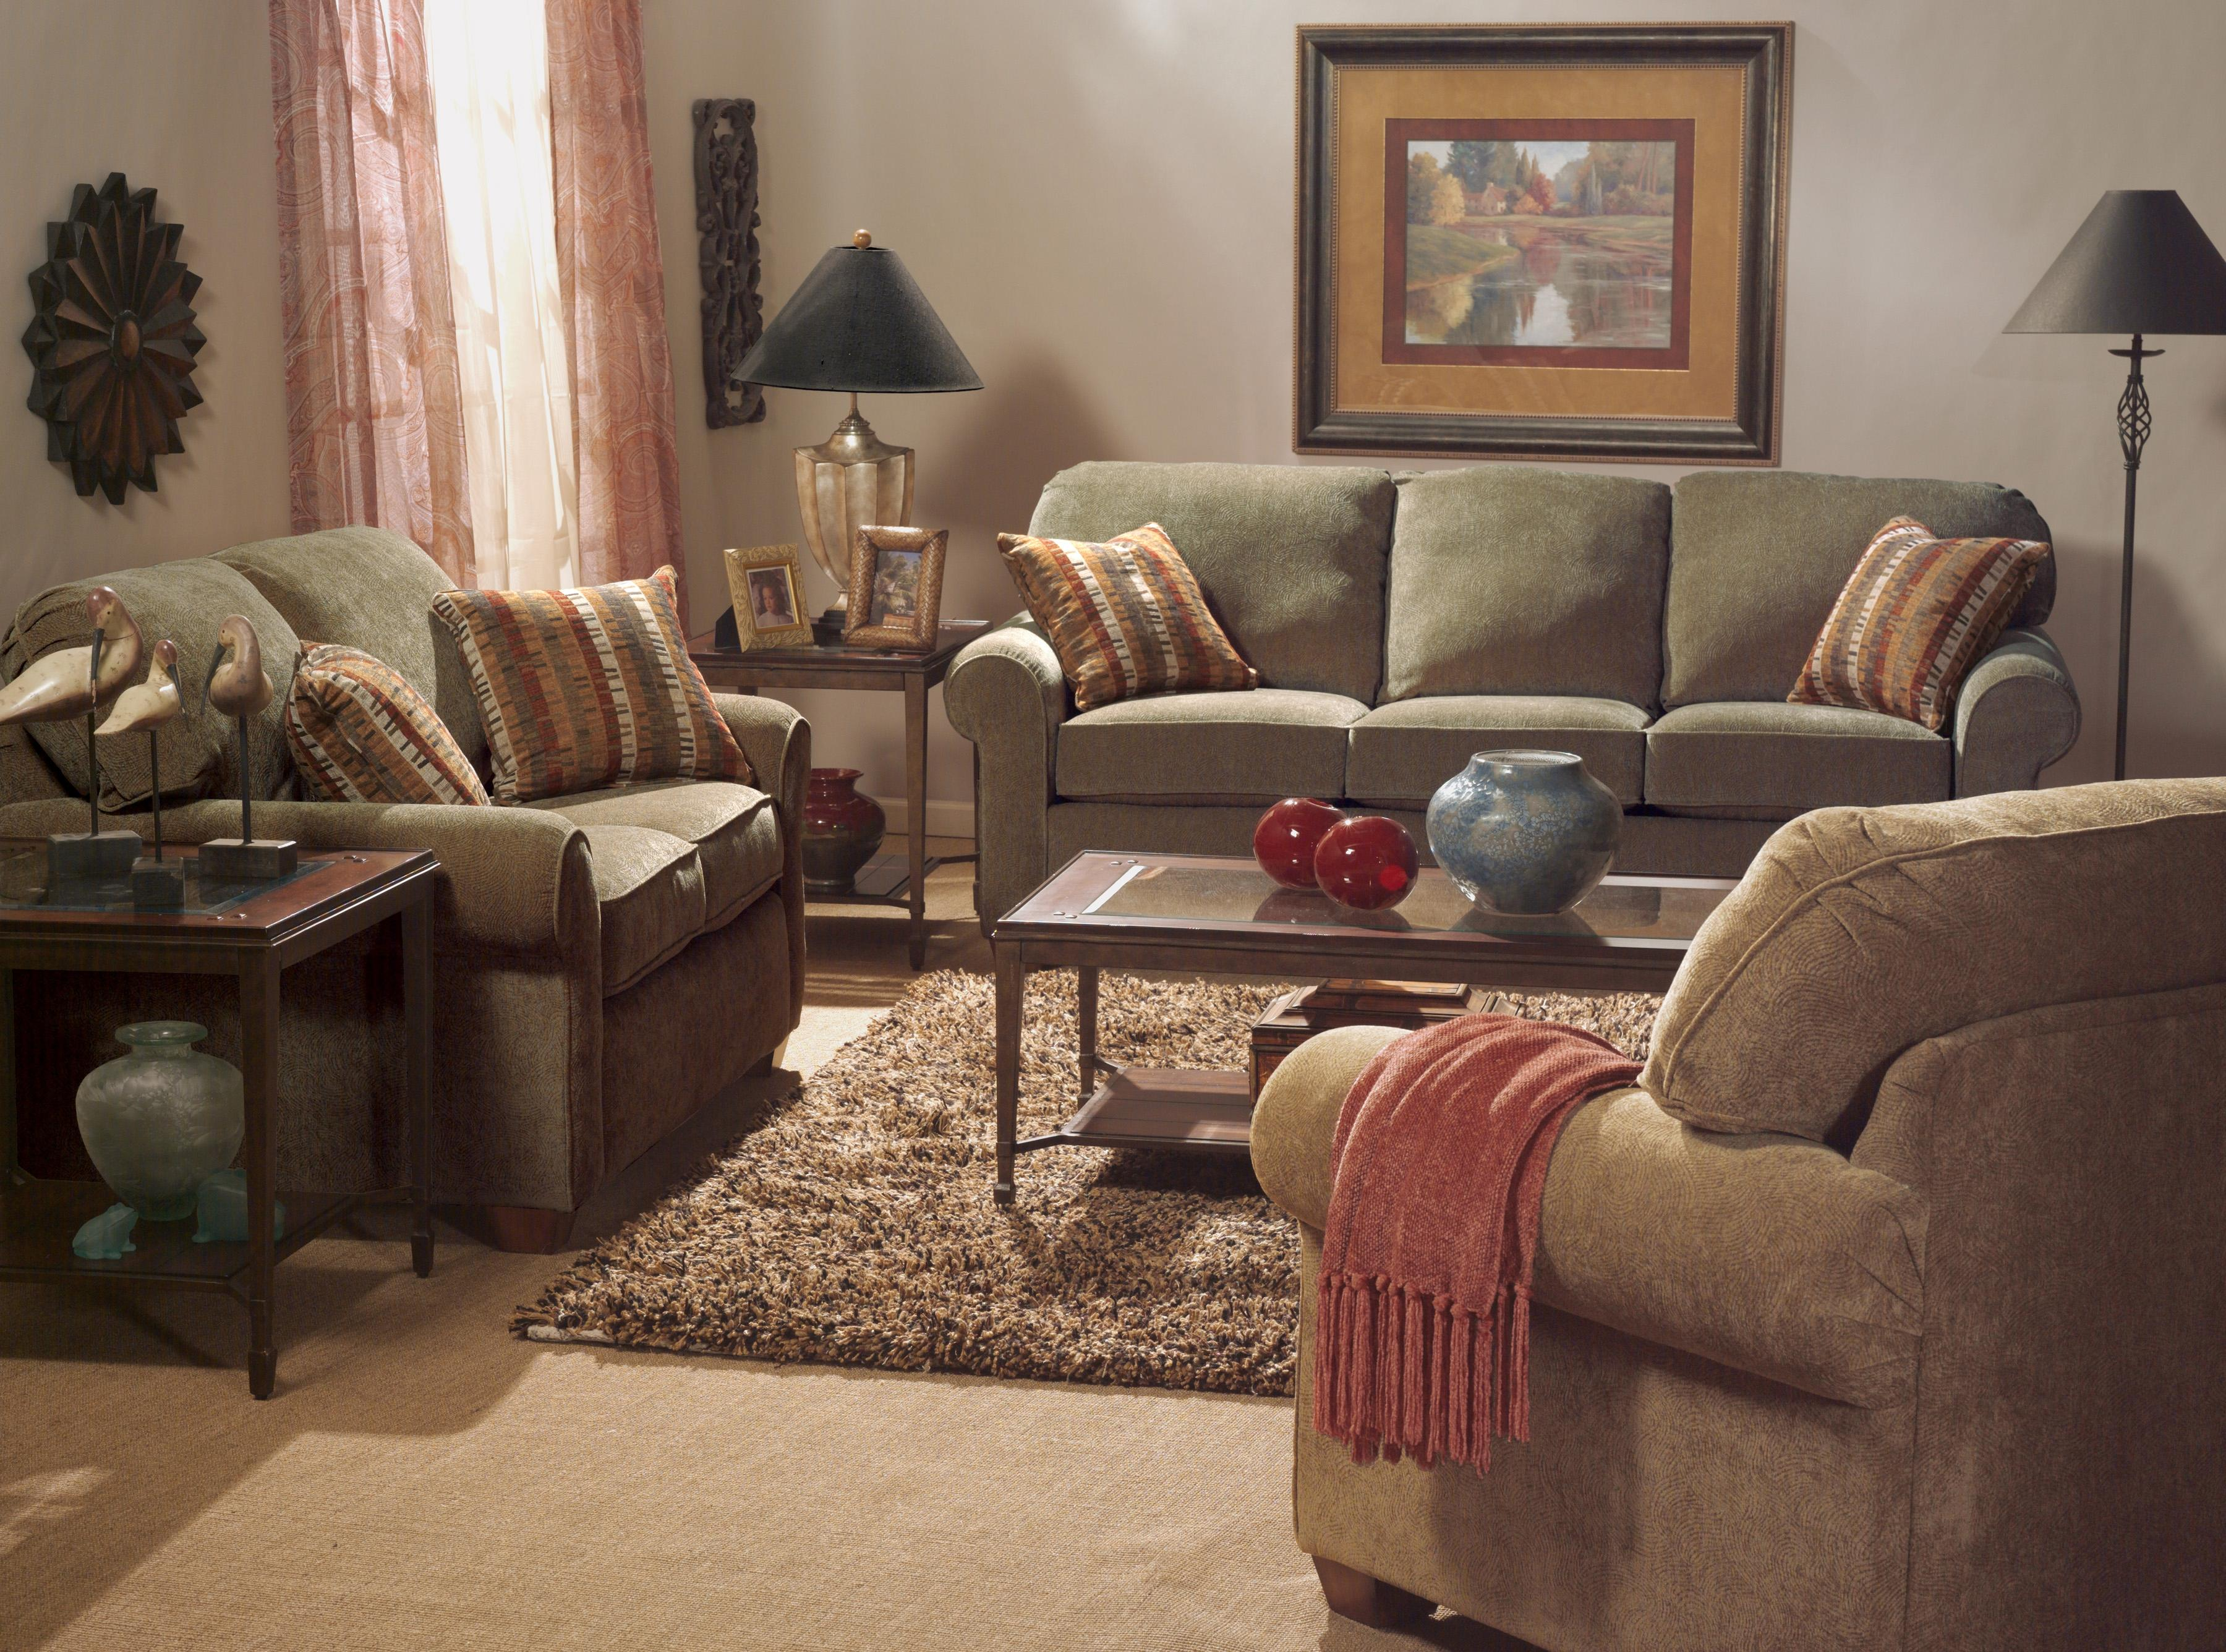 flexsteel thornton sectional sofa set blue colour price